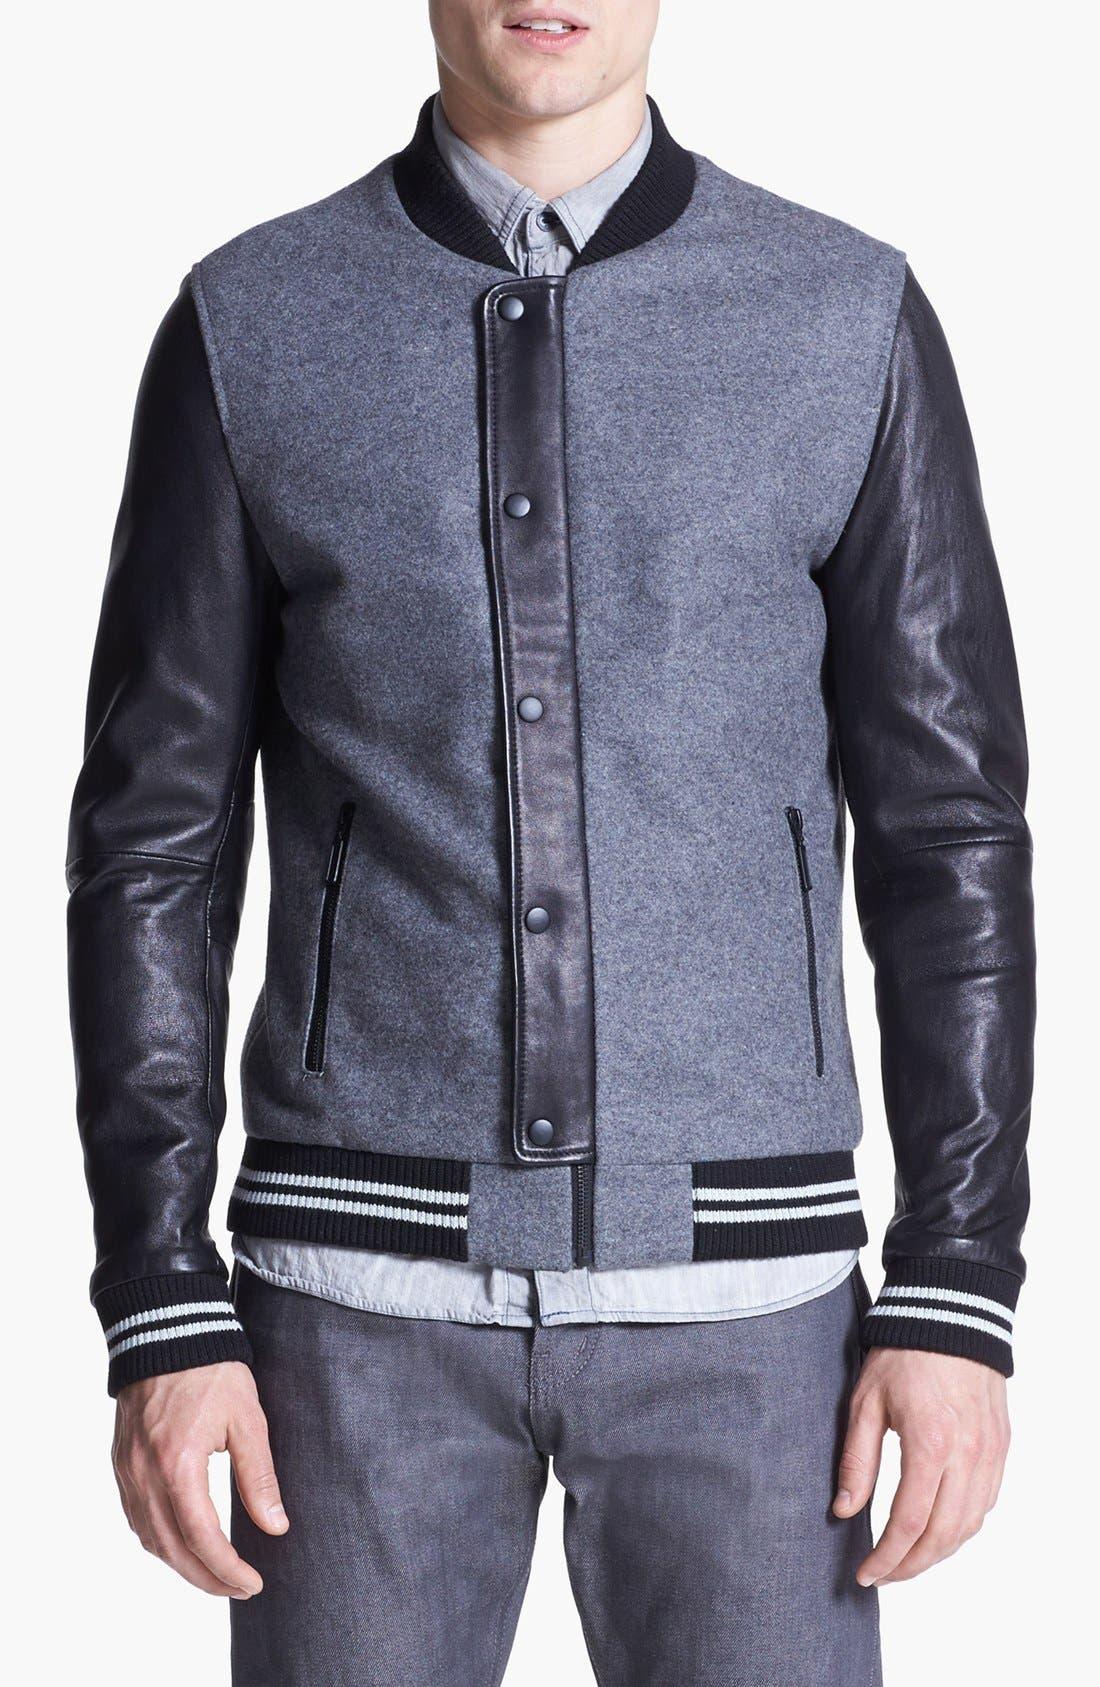 Main Image - 7 Diamonds 'Novara' Wool & Leather Varsity Jacket